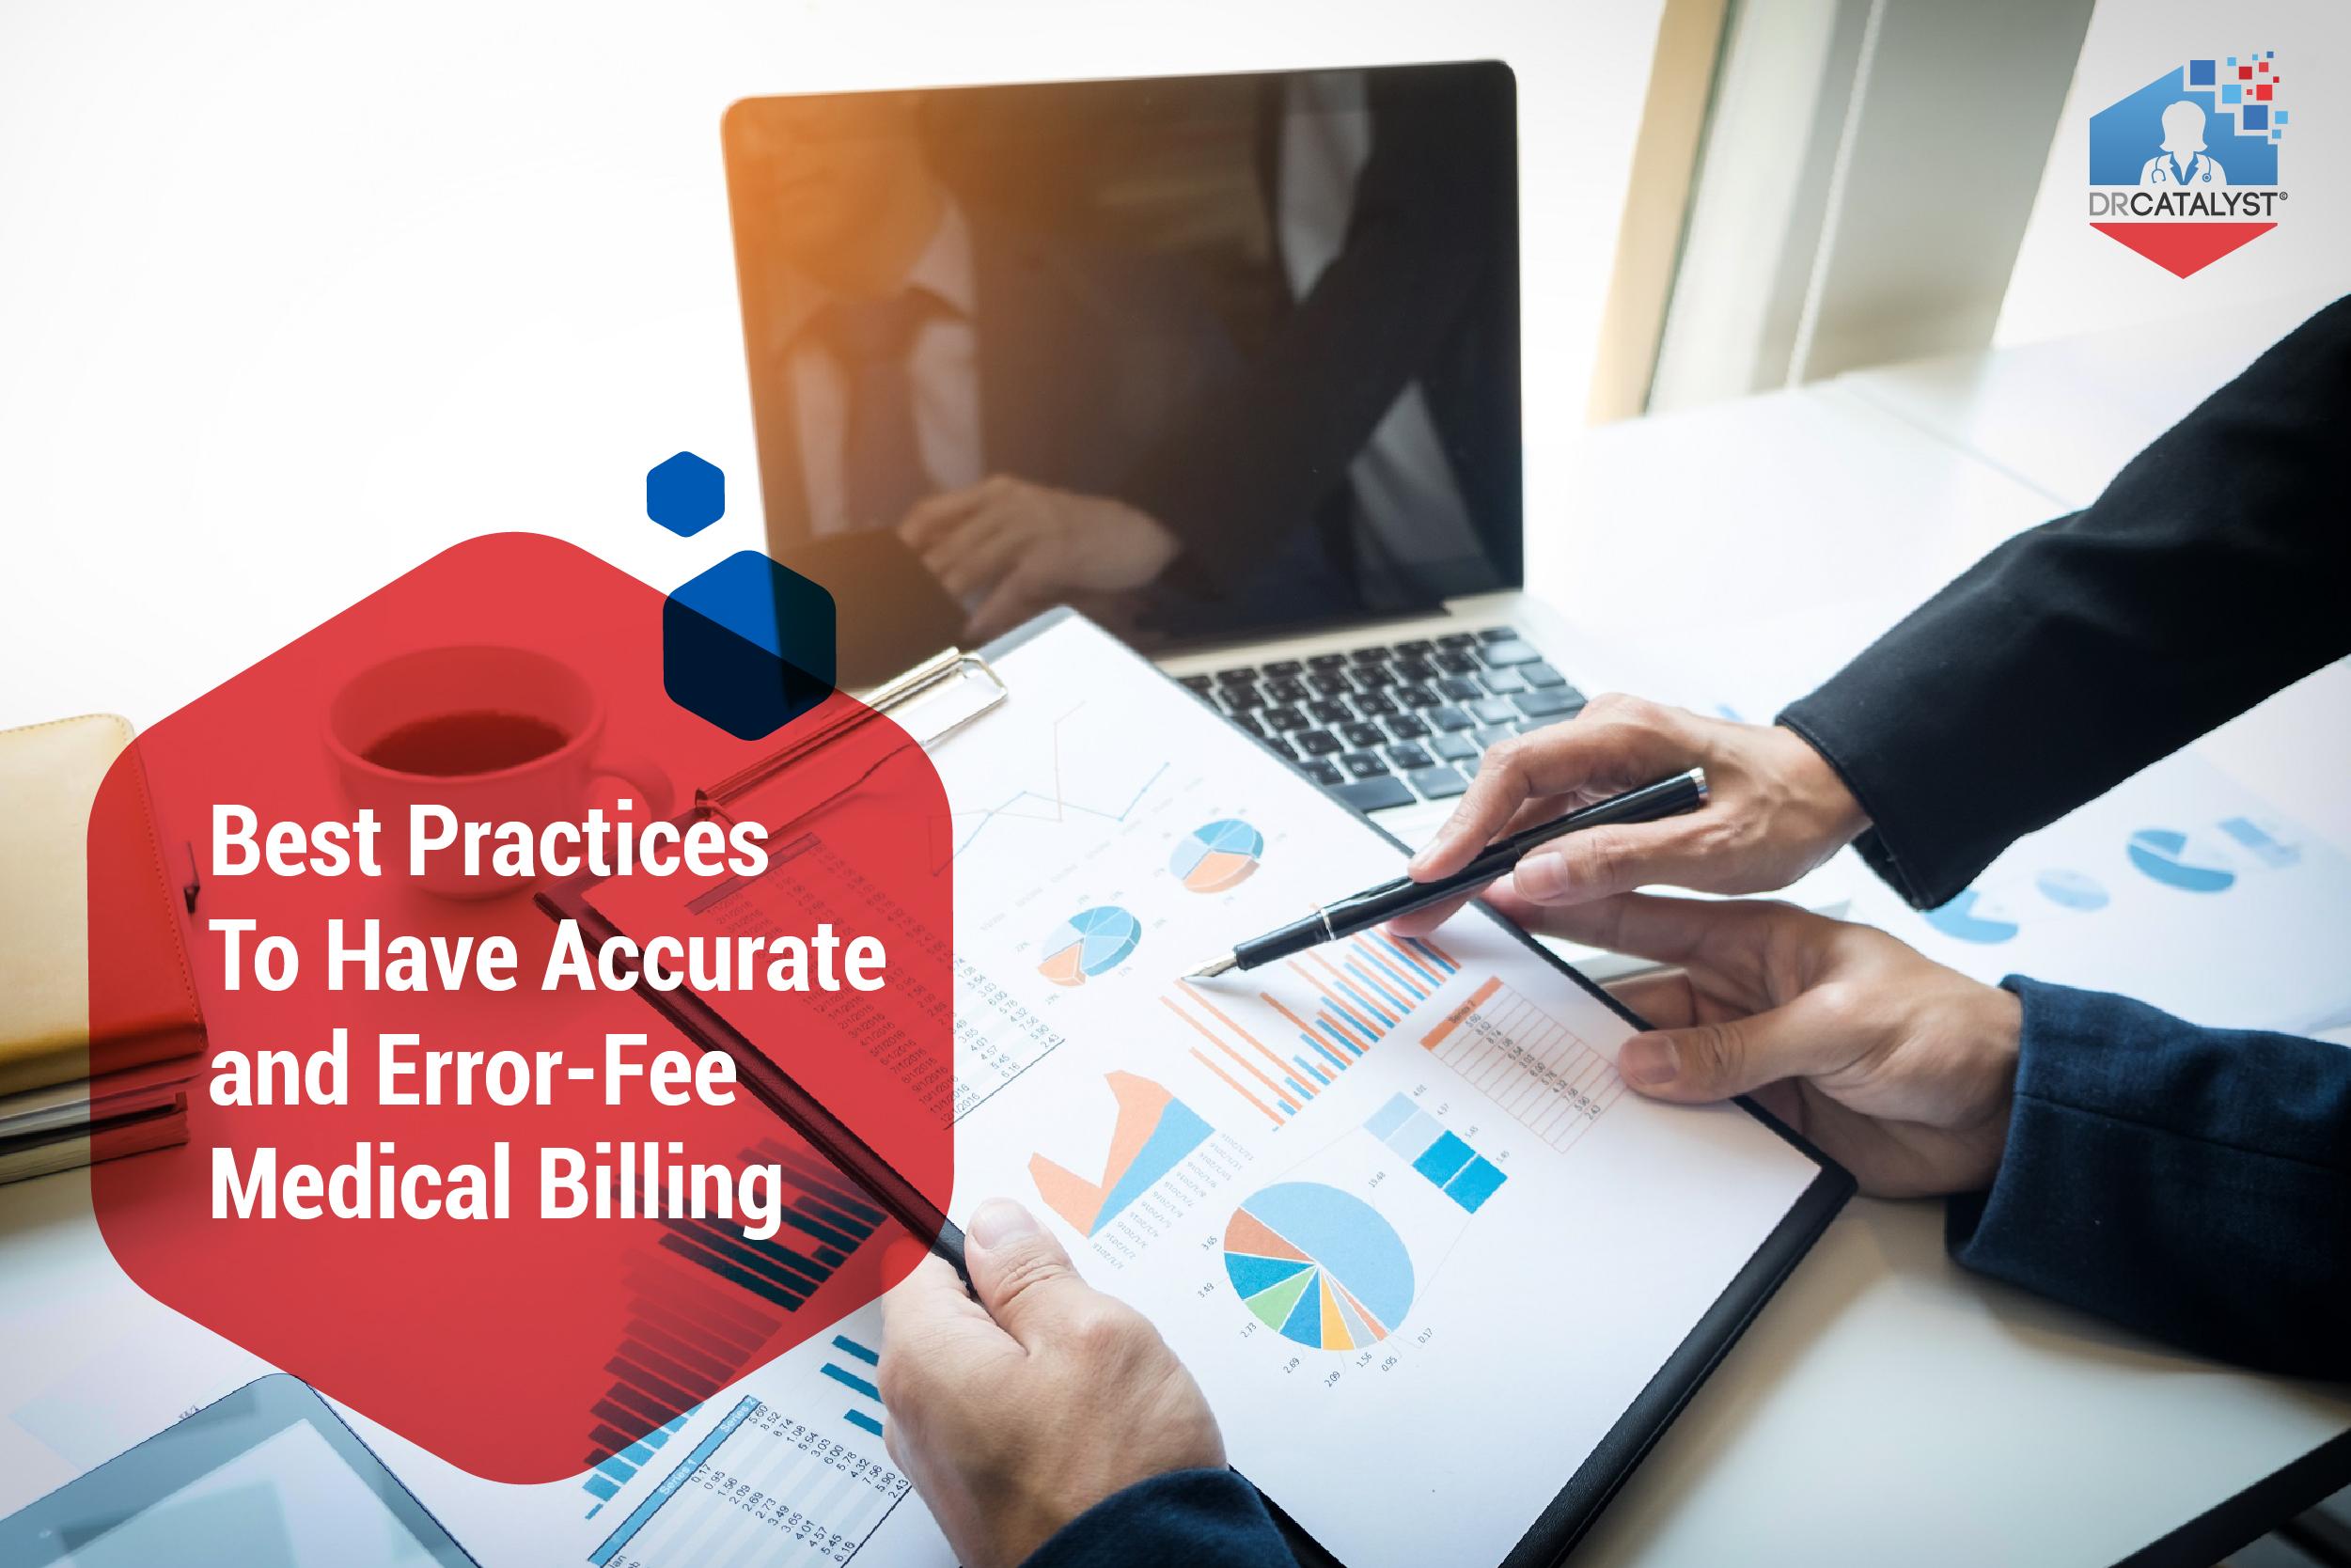 Error-Free Medical Billing